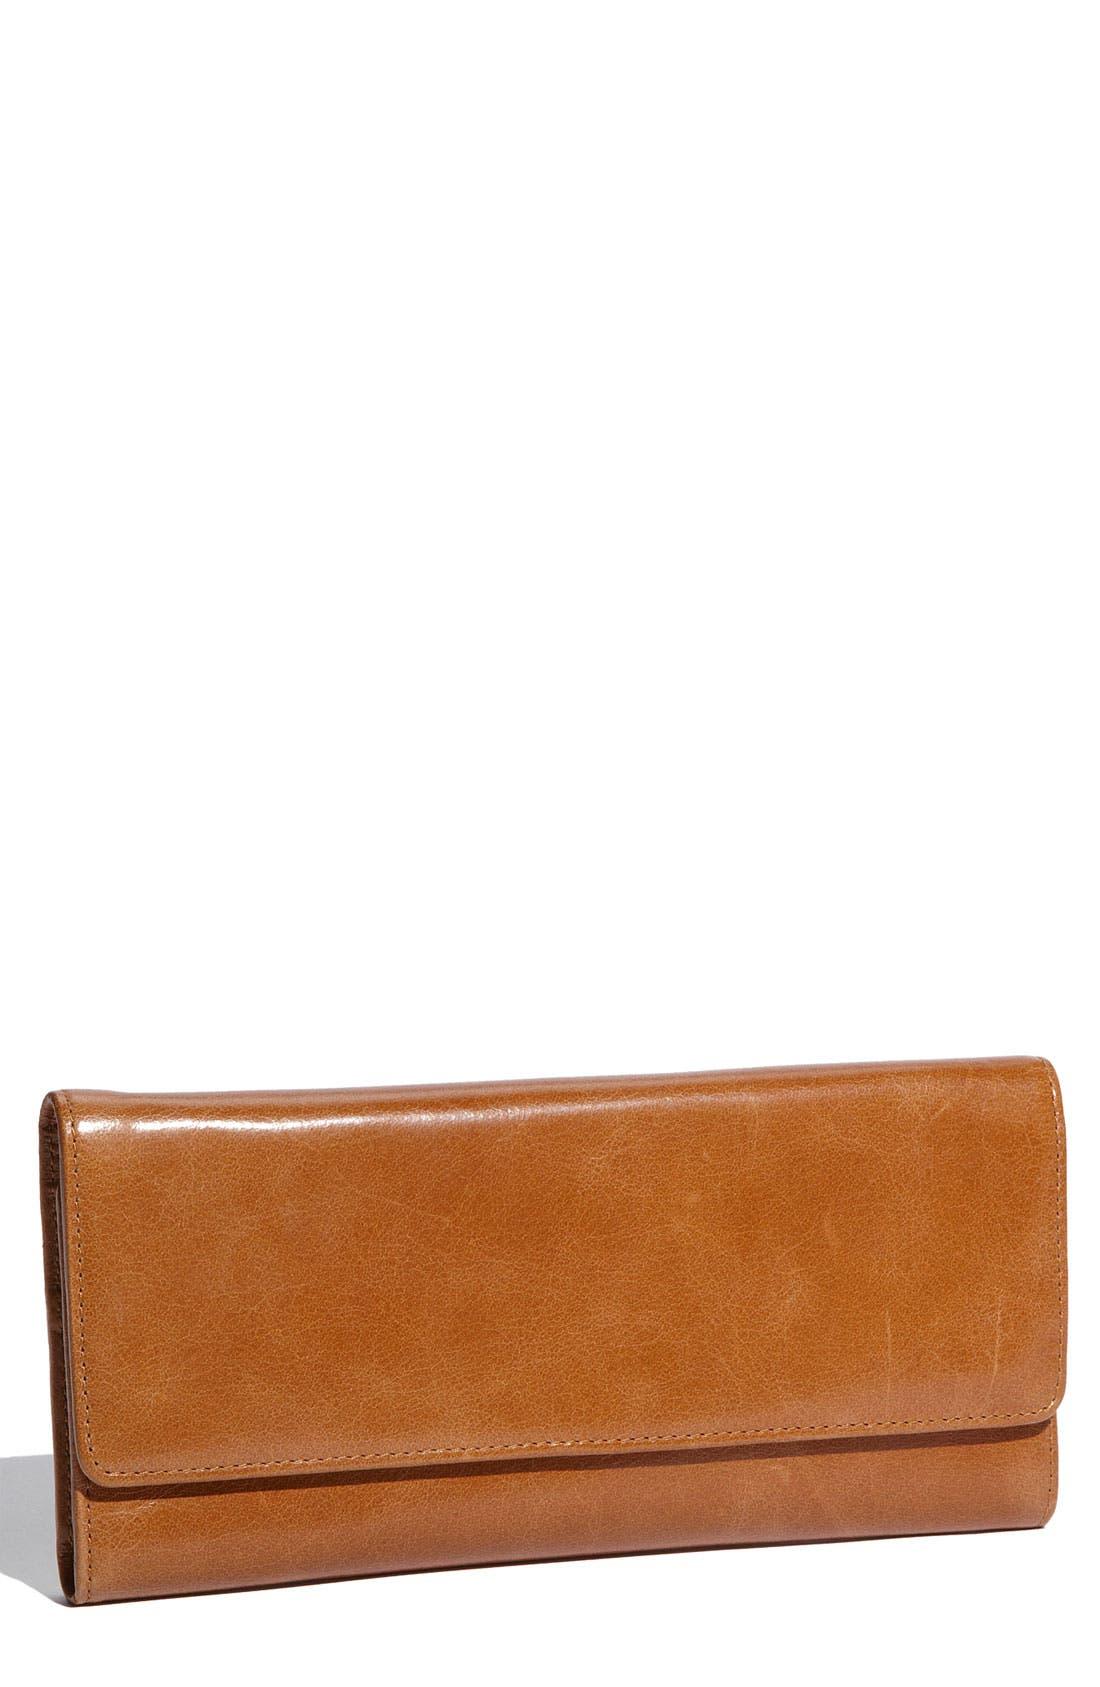 'Sadie' Leather Wallet,                             Main thumbnail 28, color,